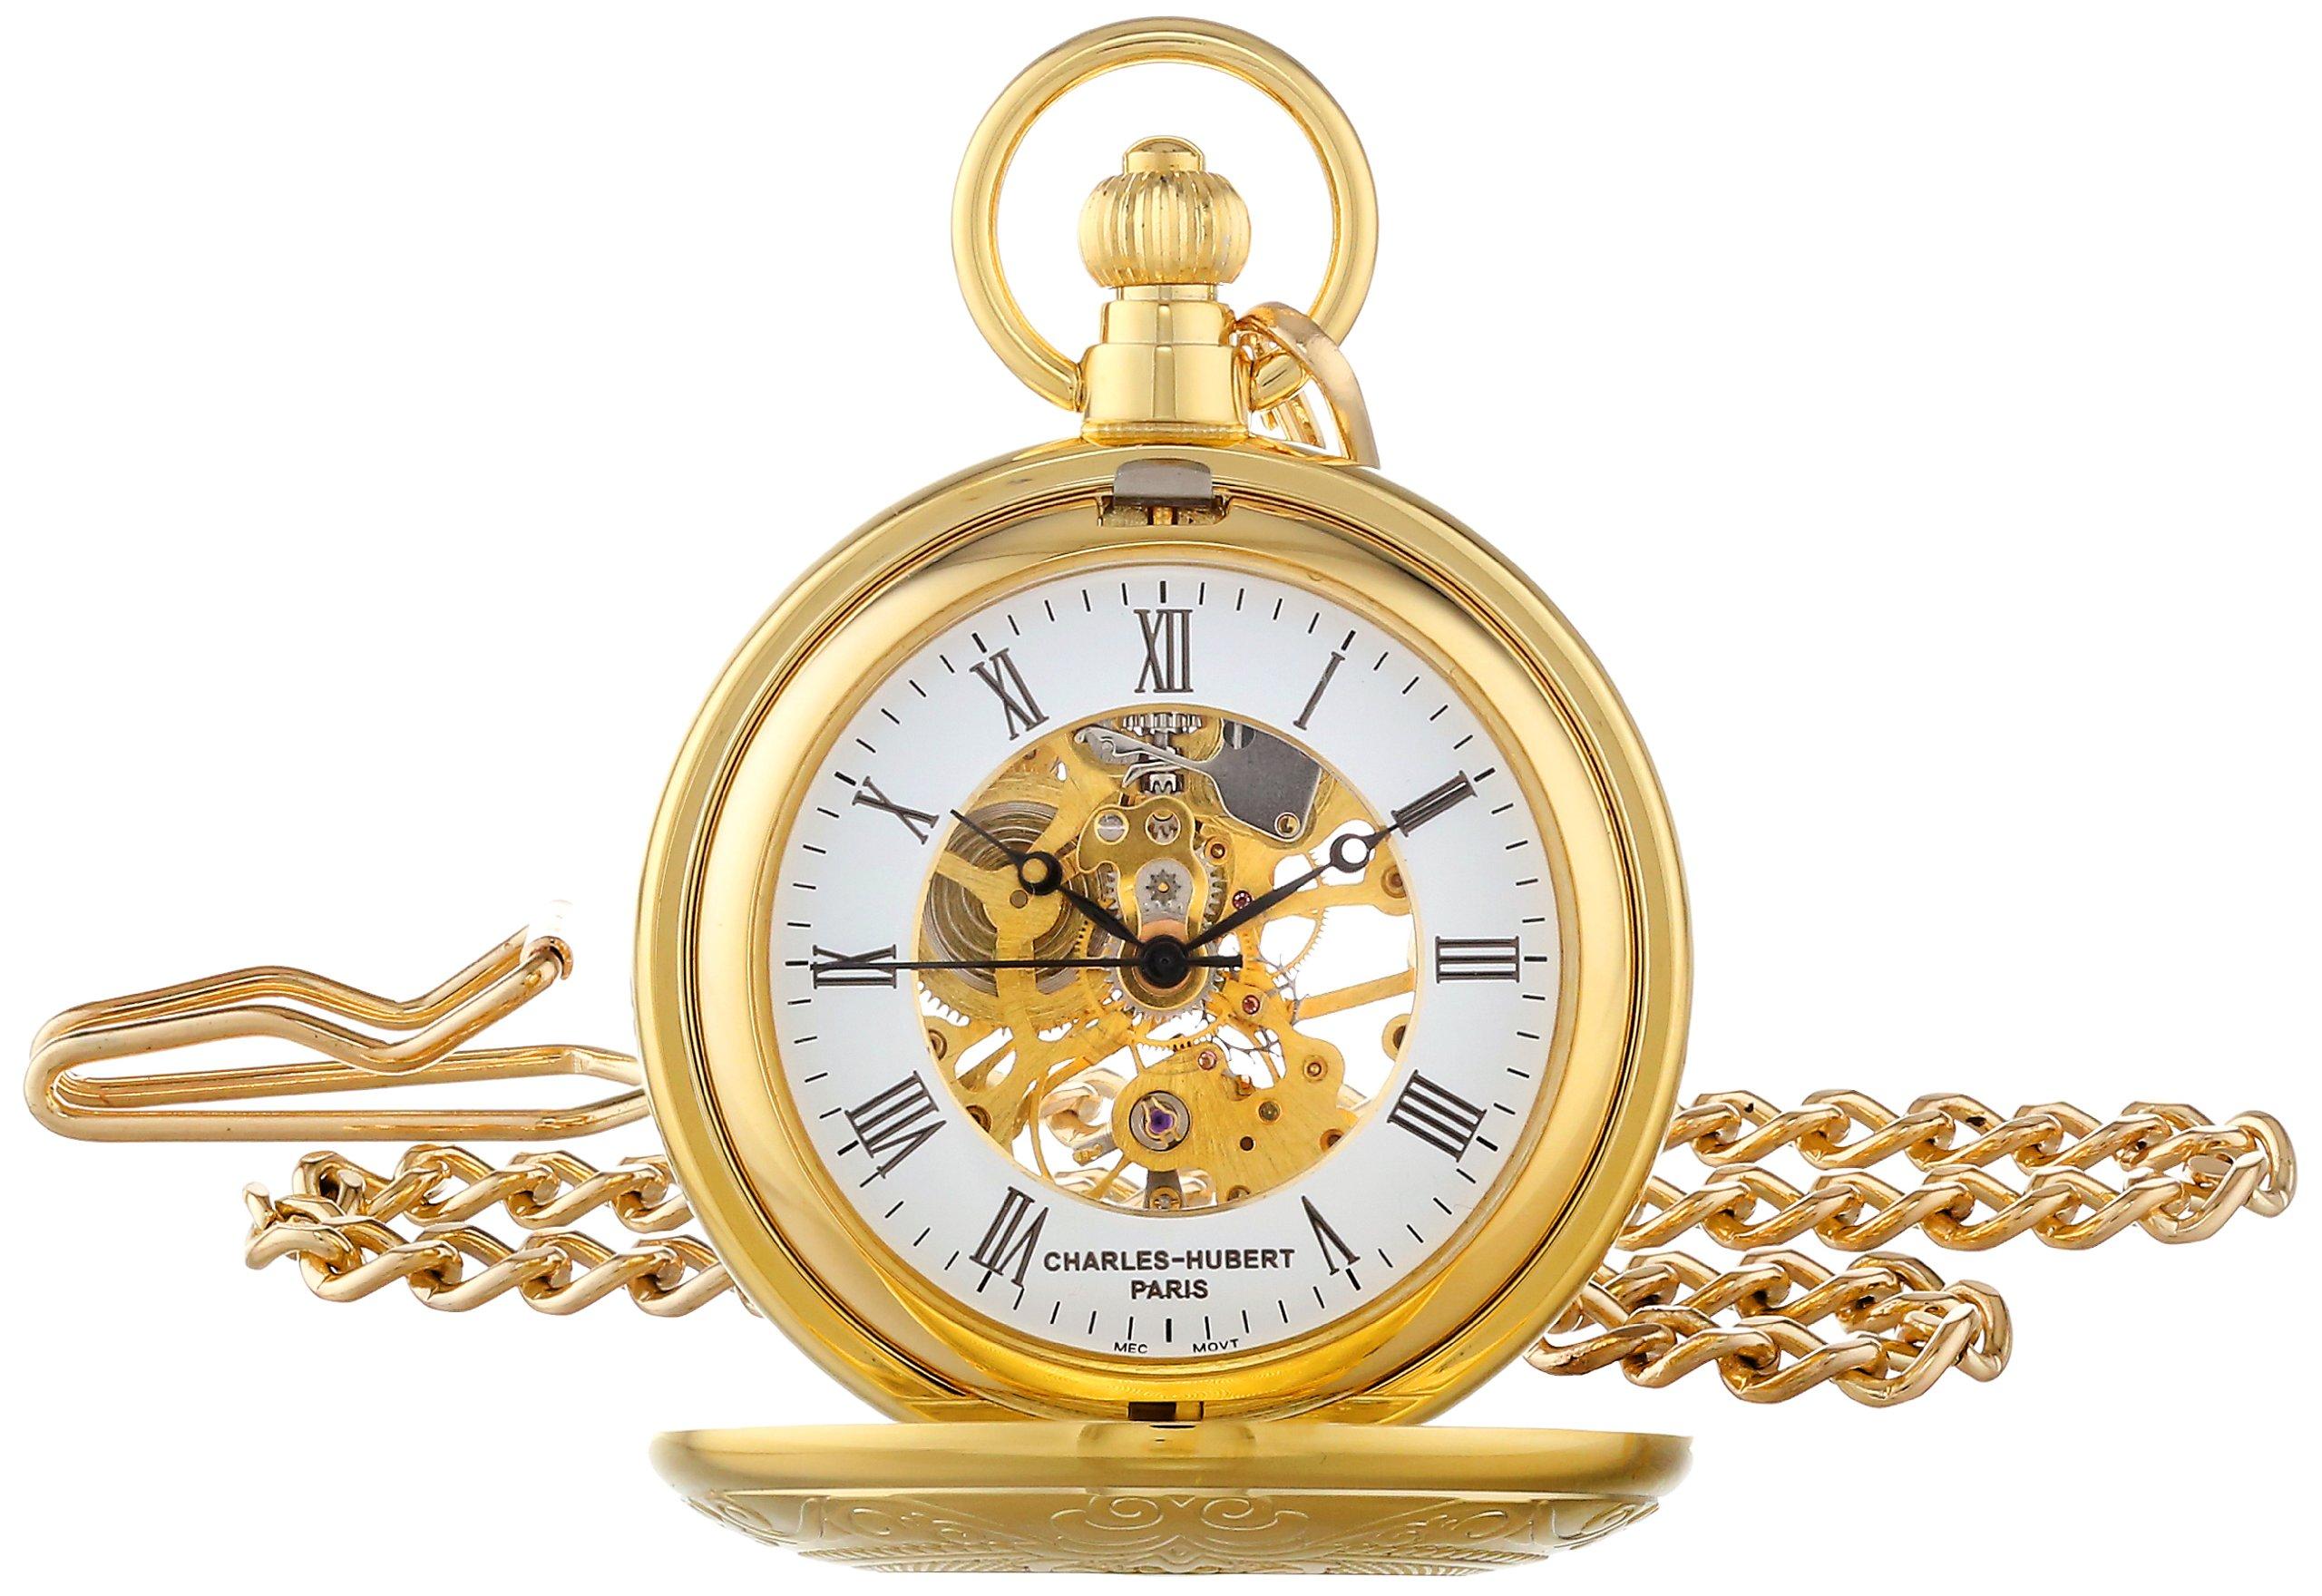 Charles-Hubert, Paris Gold-Plated Mechanical Pocket Watch by CHARLES-HUBERT PARIS (Image #1)